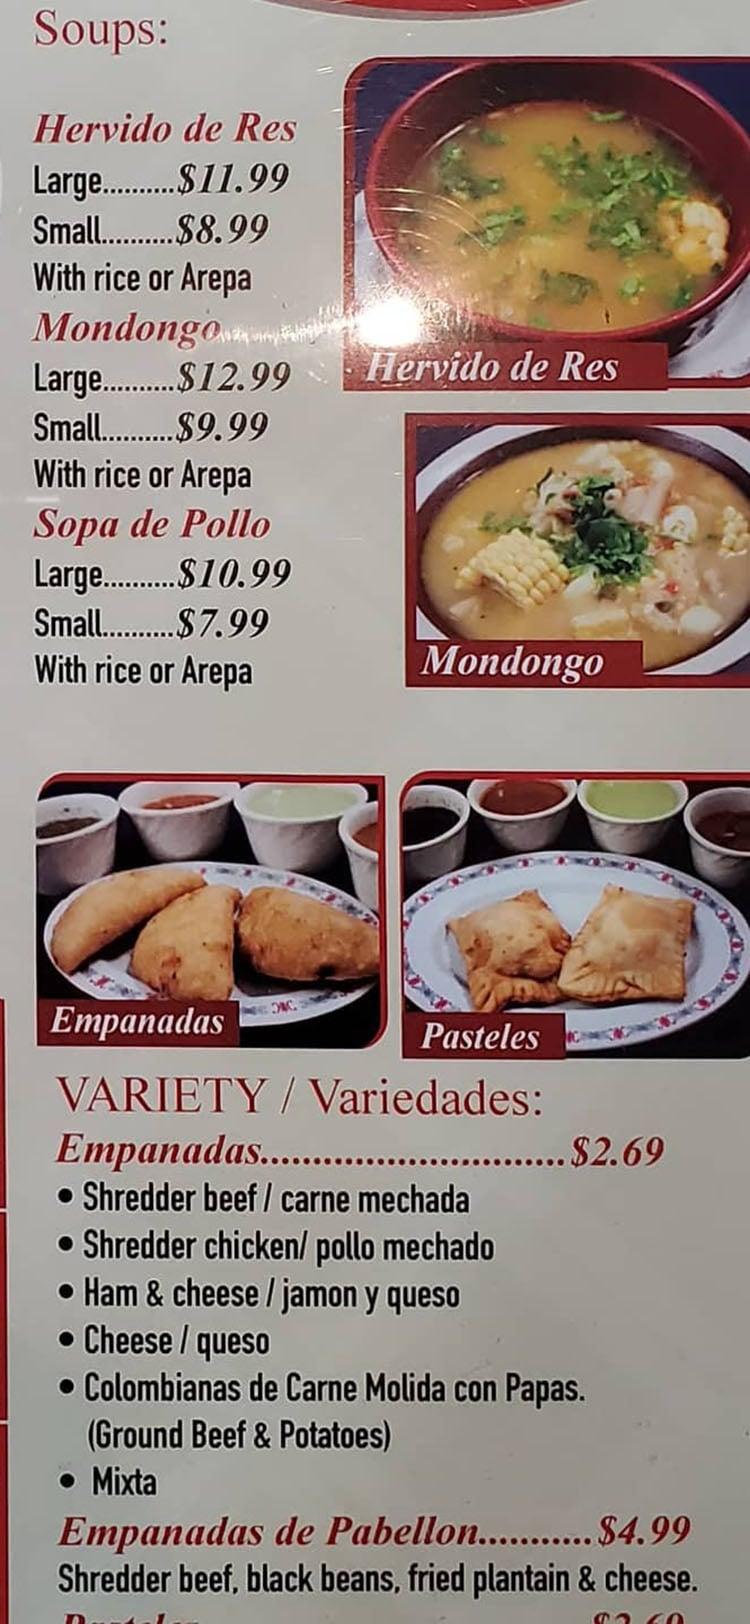 Sabor Latino menu - soups, empanadas